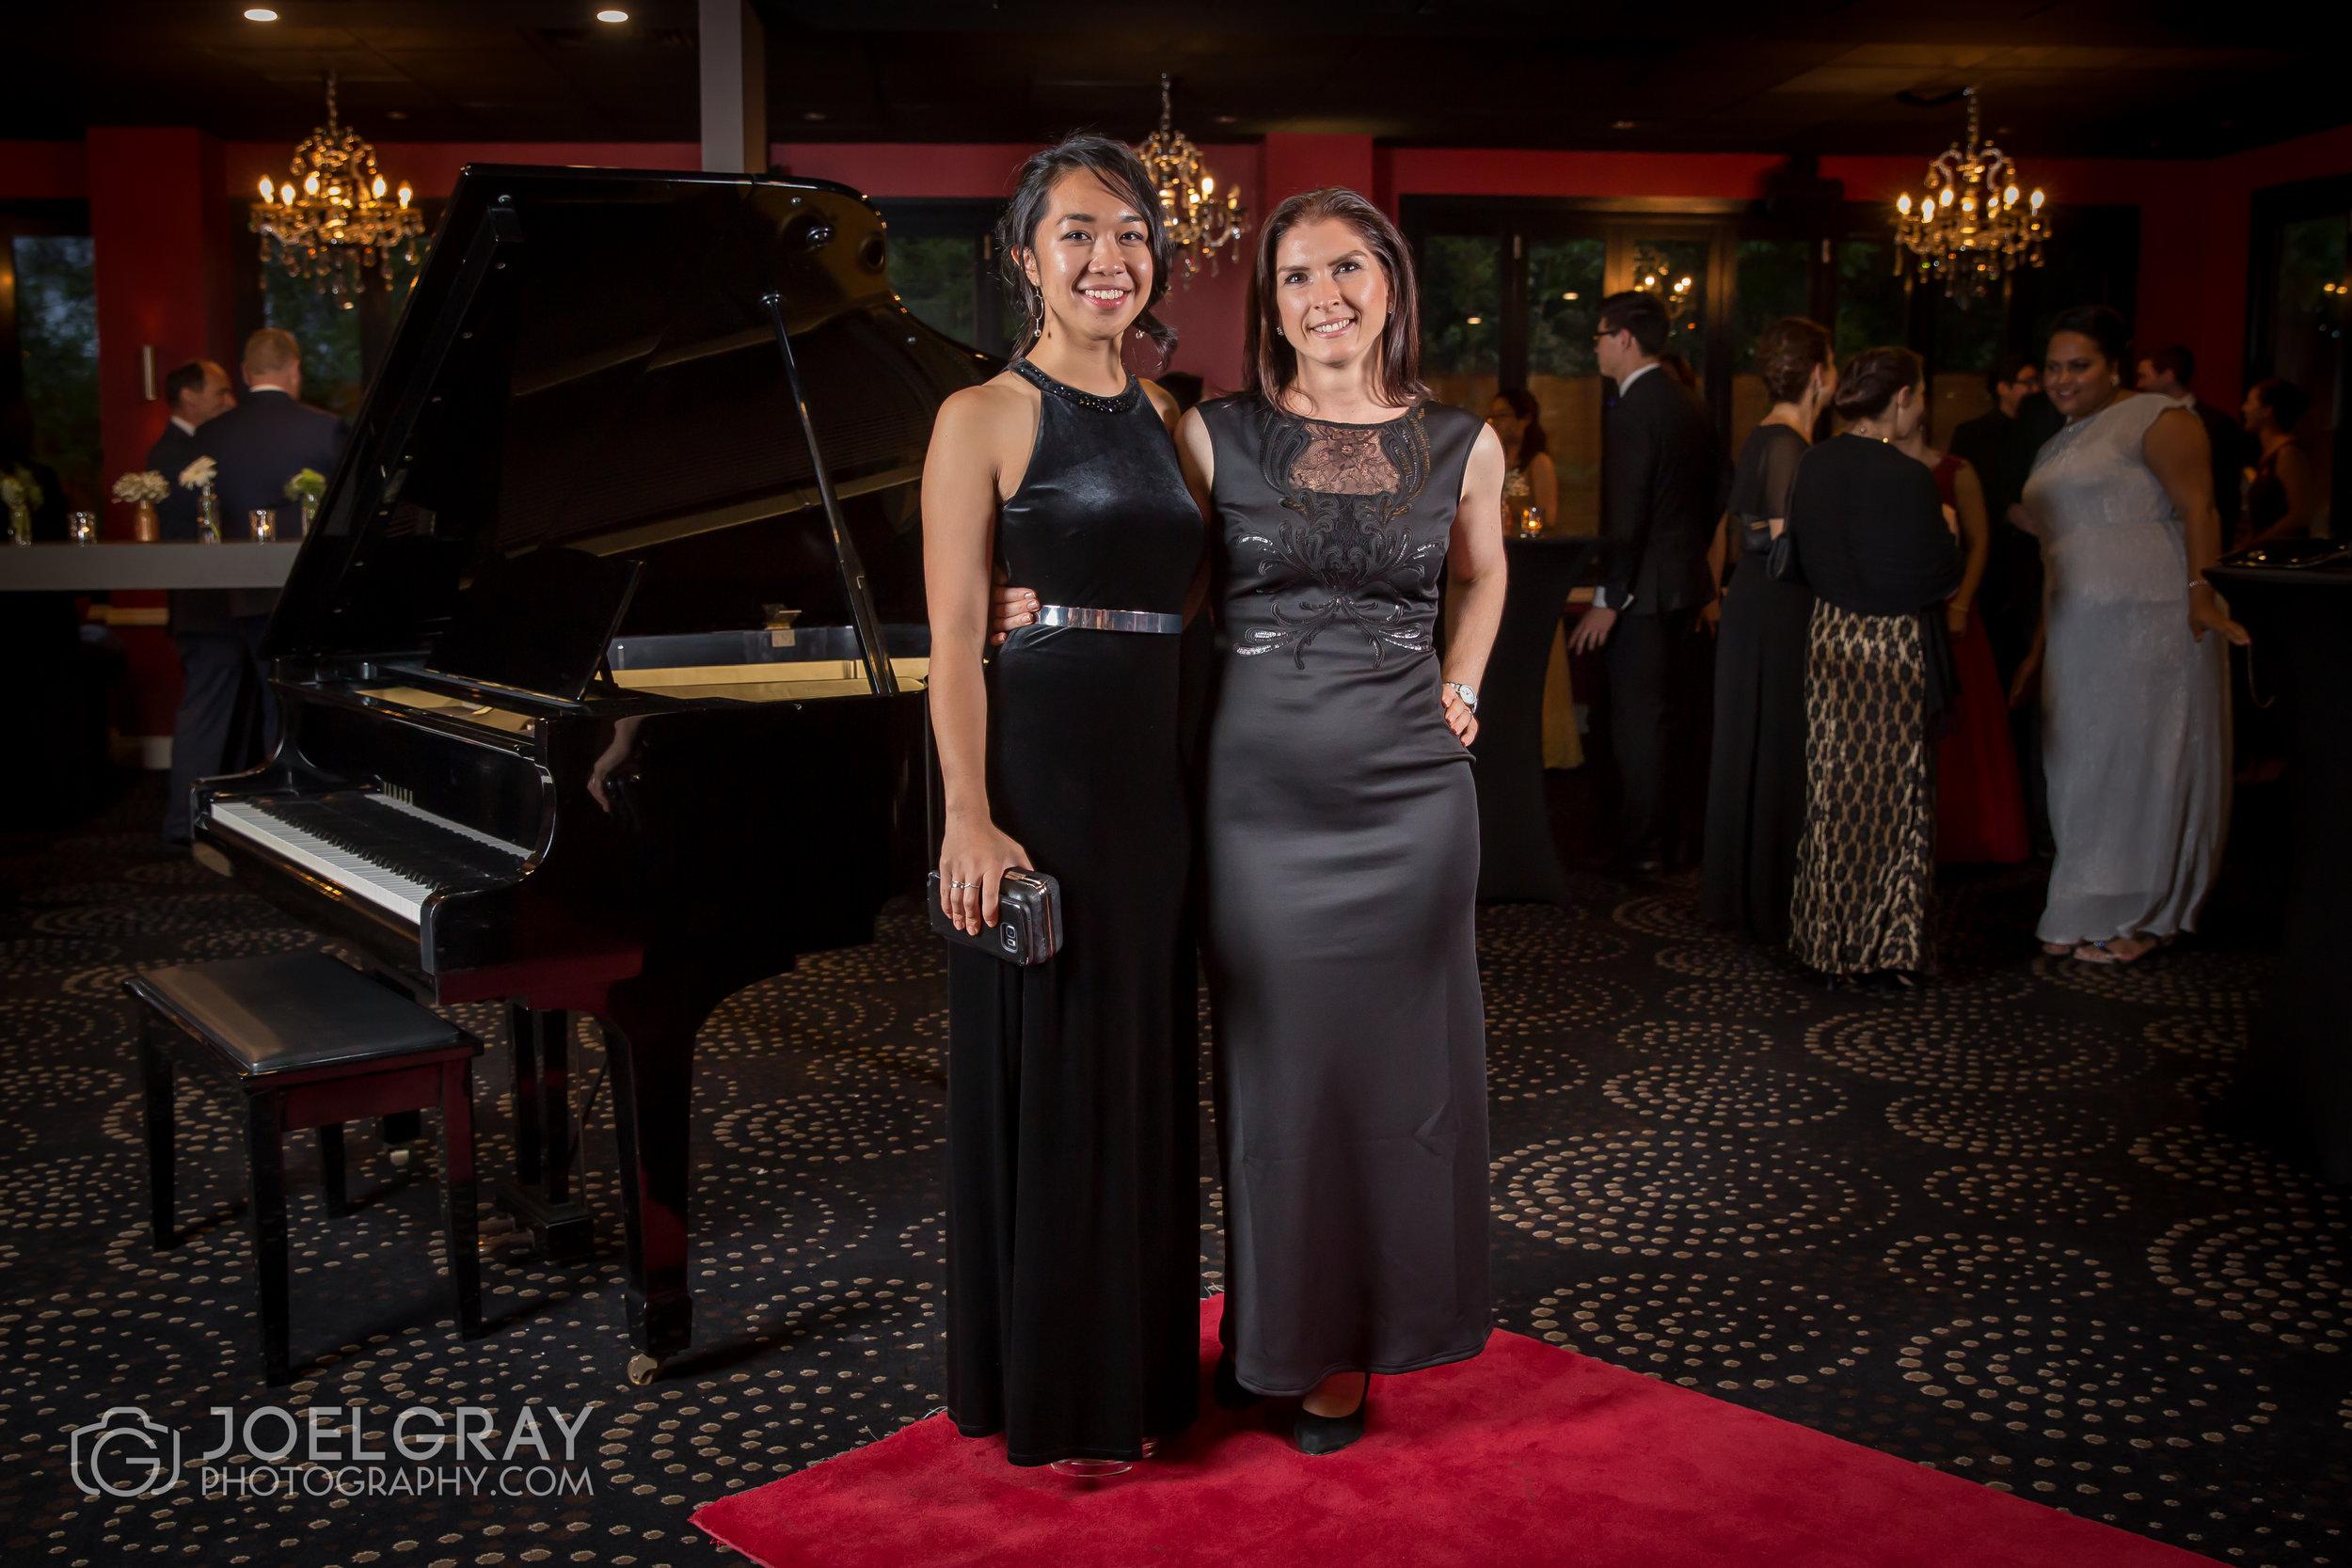 event-photos-events-photographer-sydney-1800829994